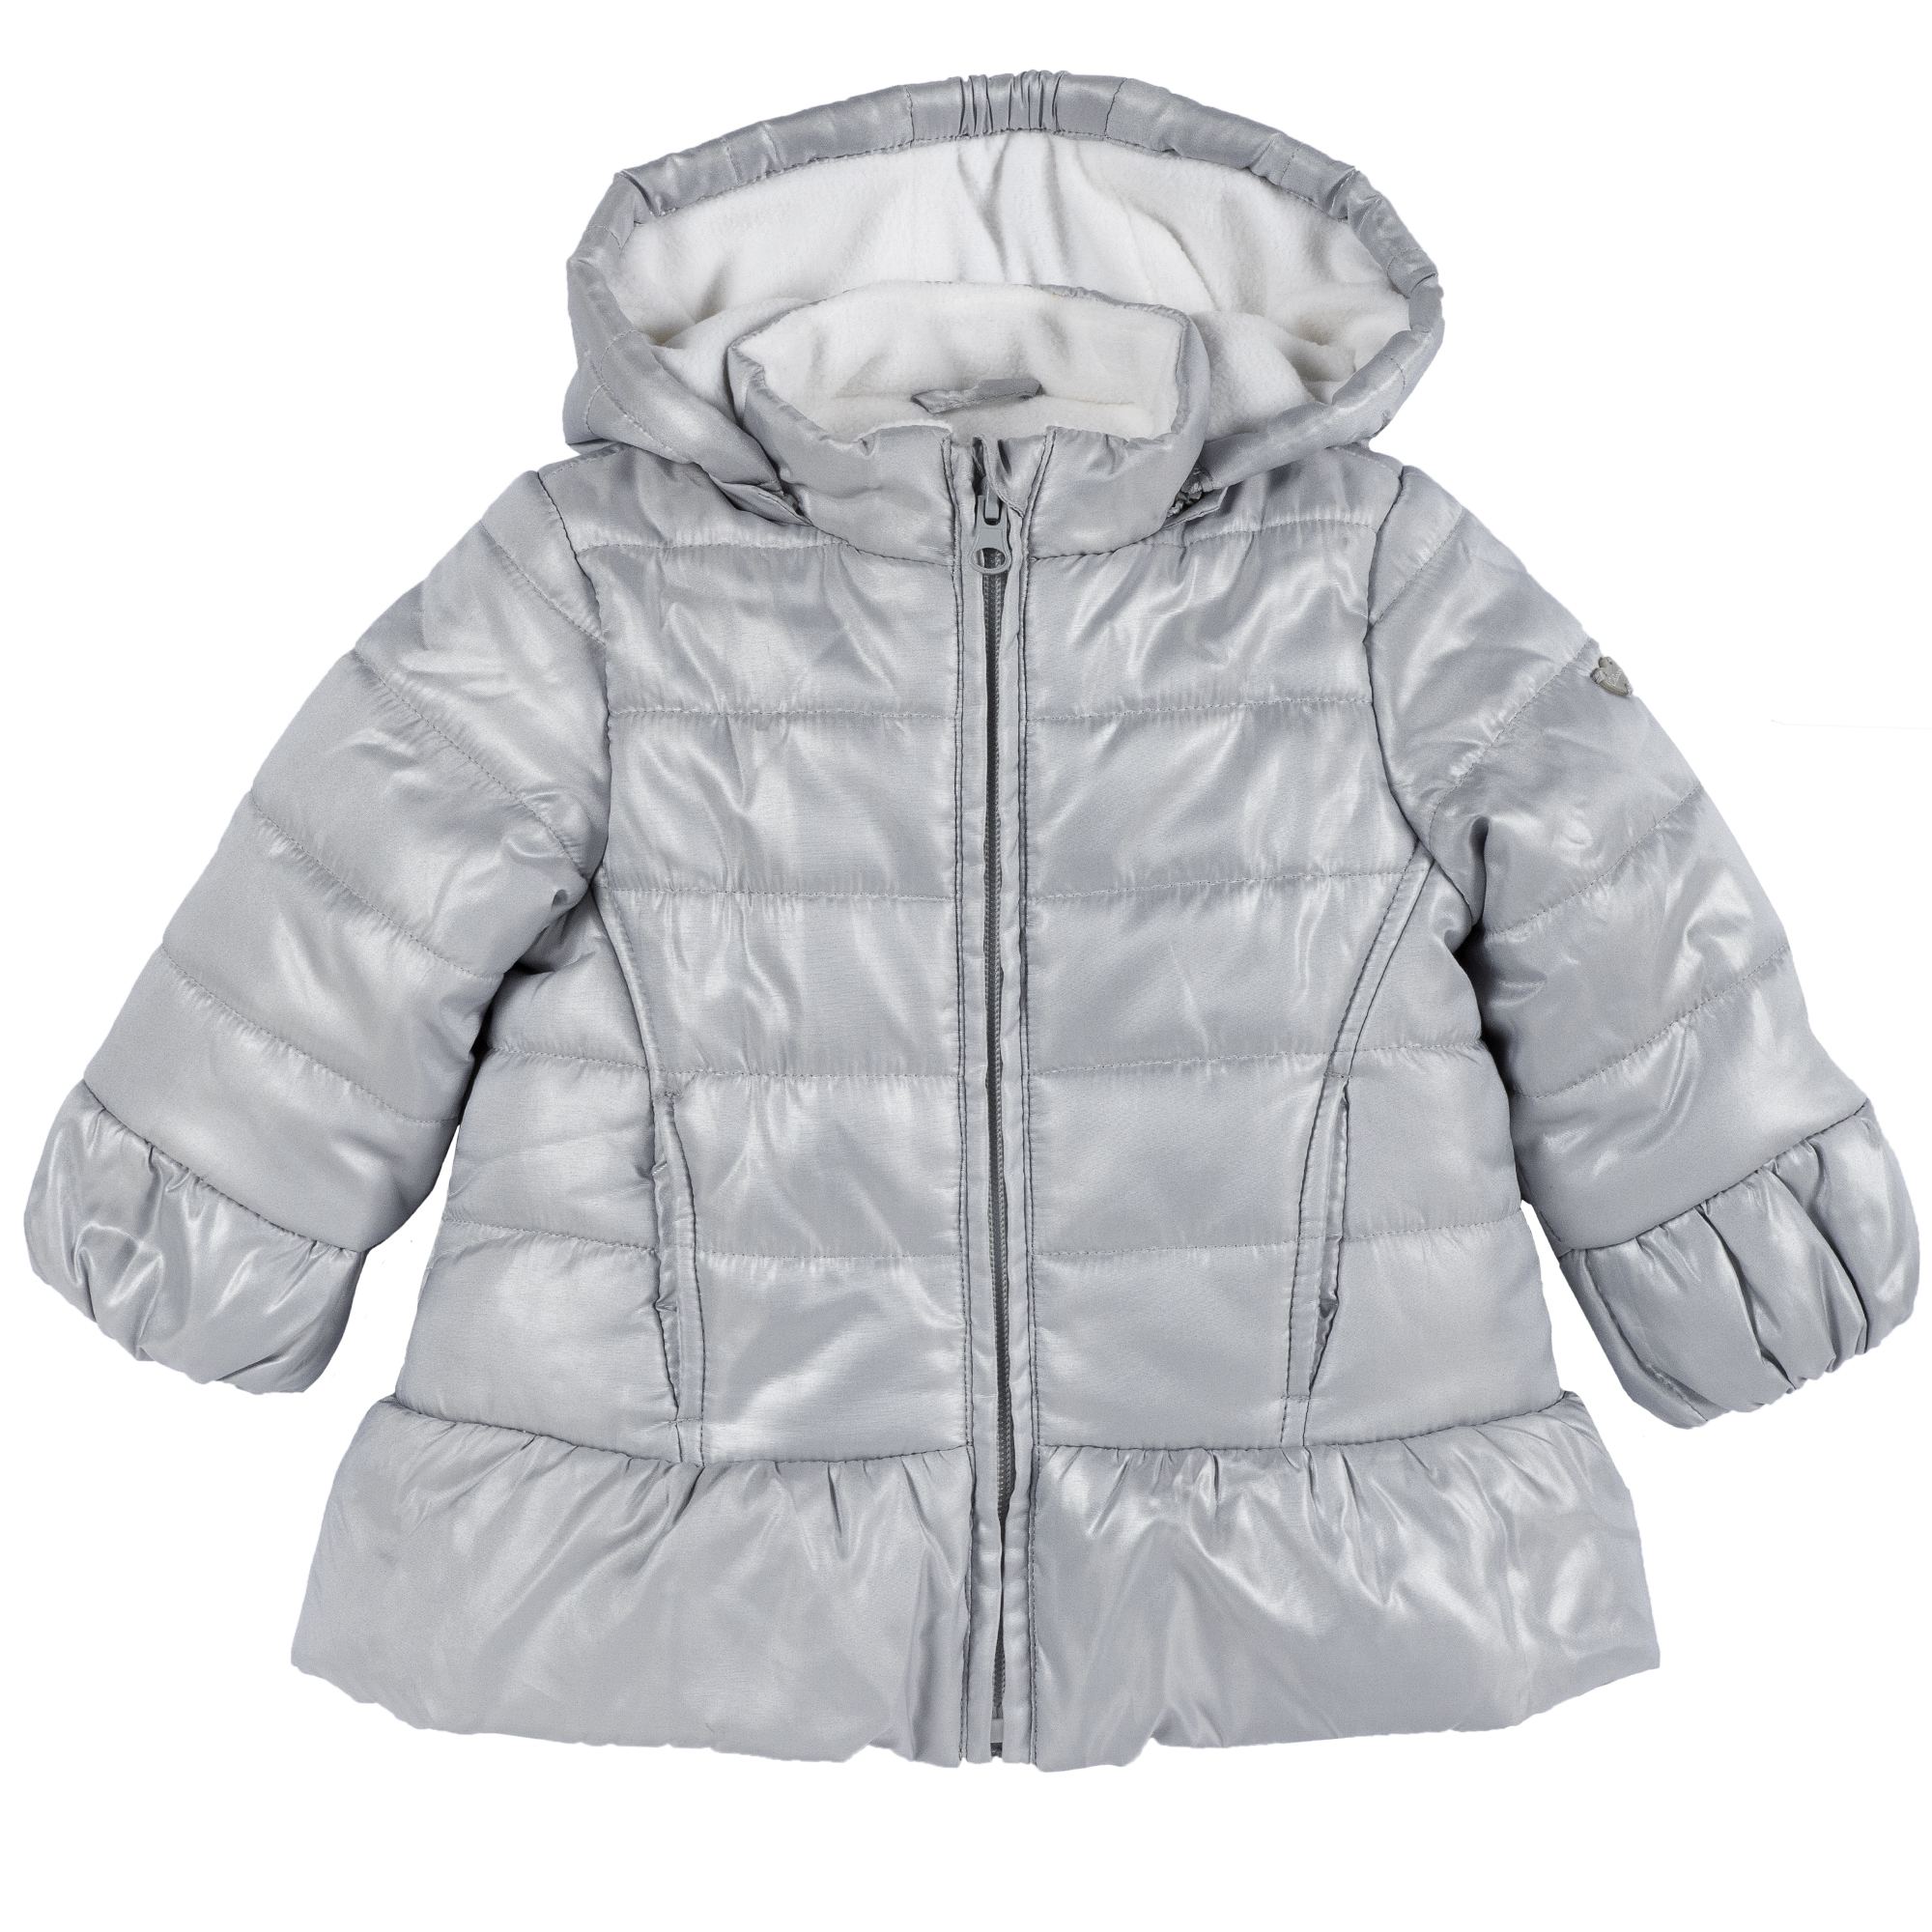 Jacheta copii Chicco, gri deschis